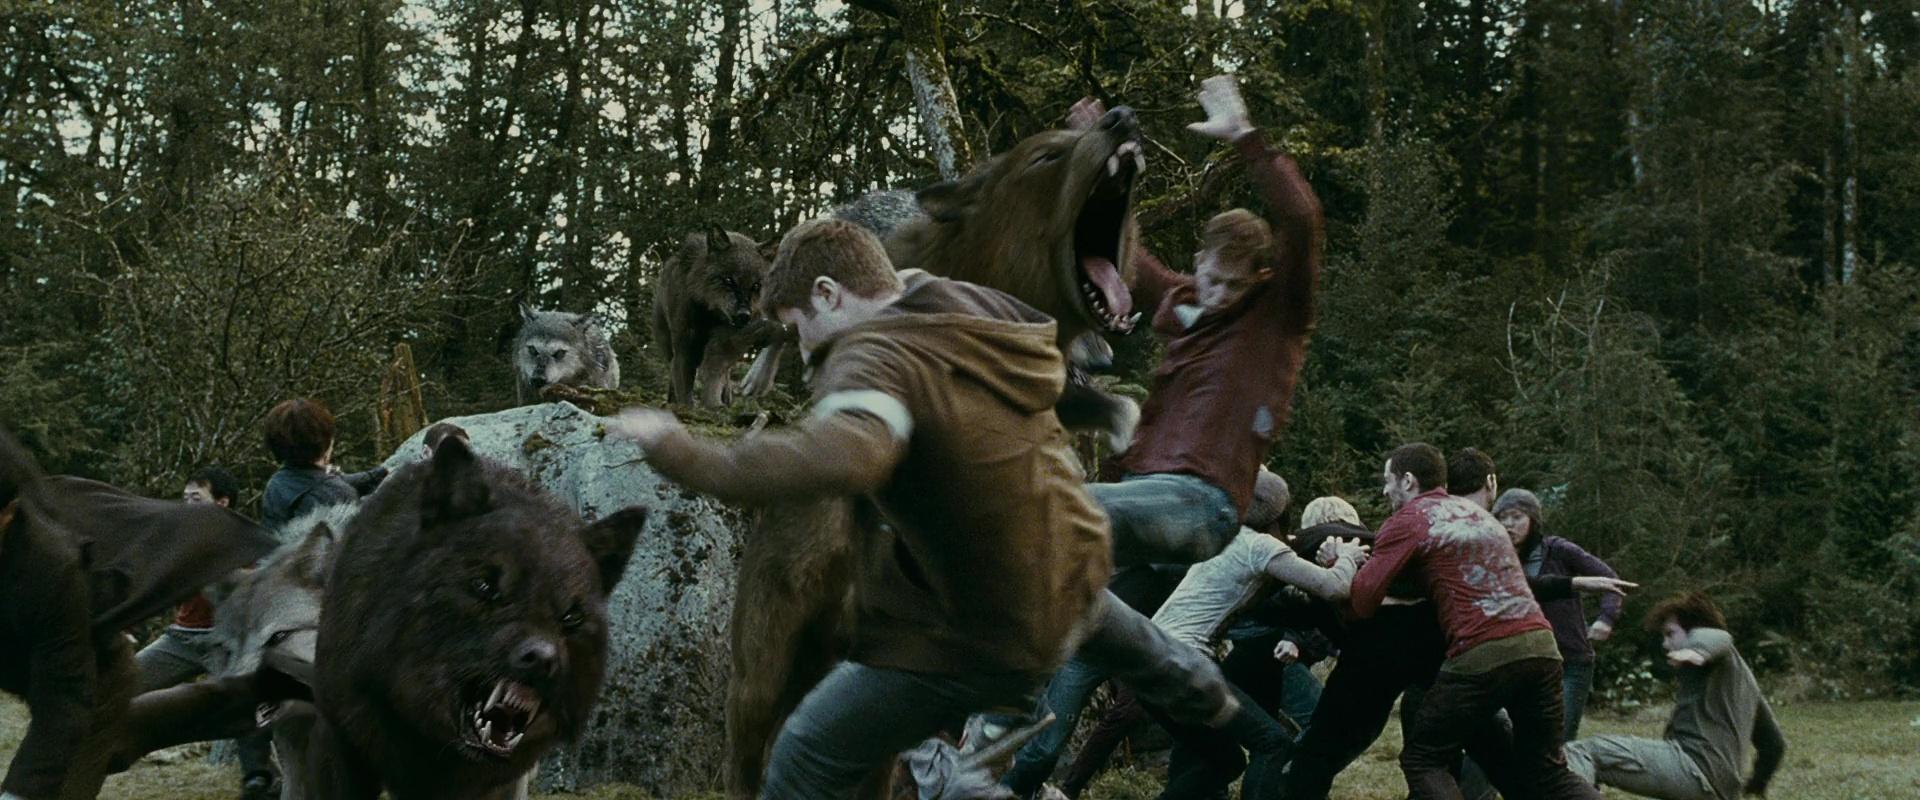 werewolf fight Quotes